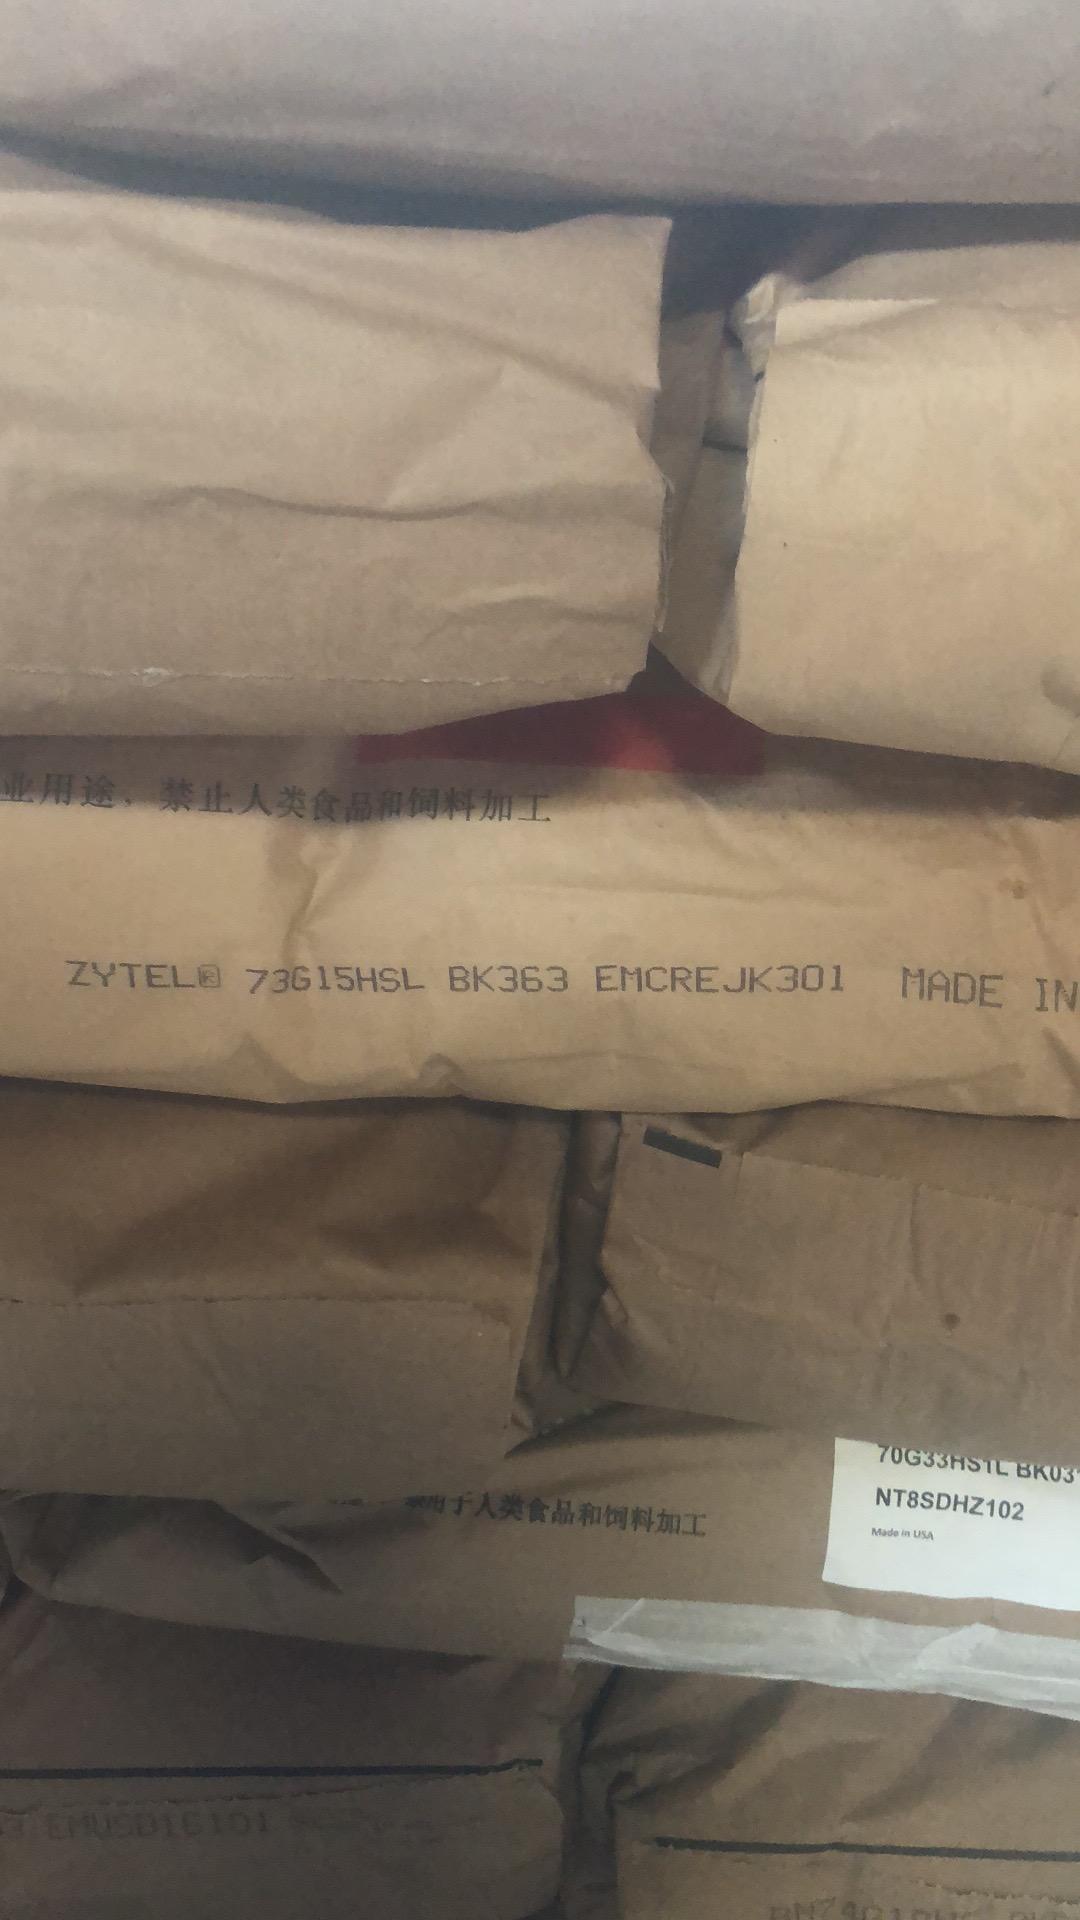 ZYTEL 73G15HSL